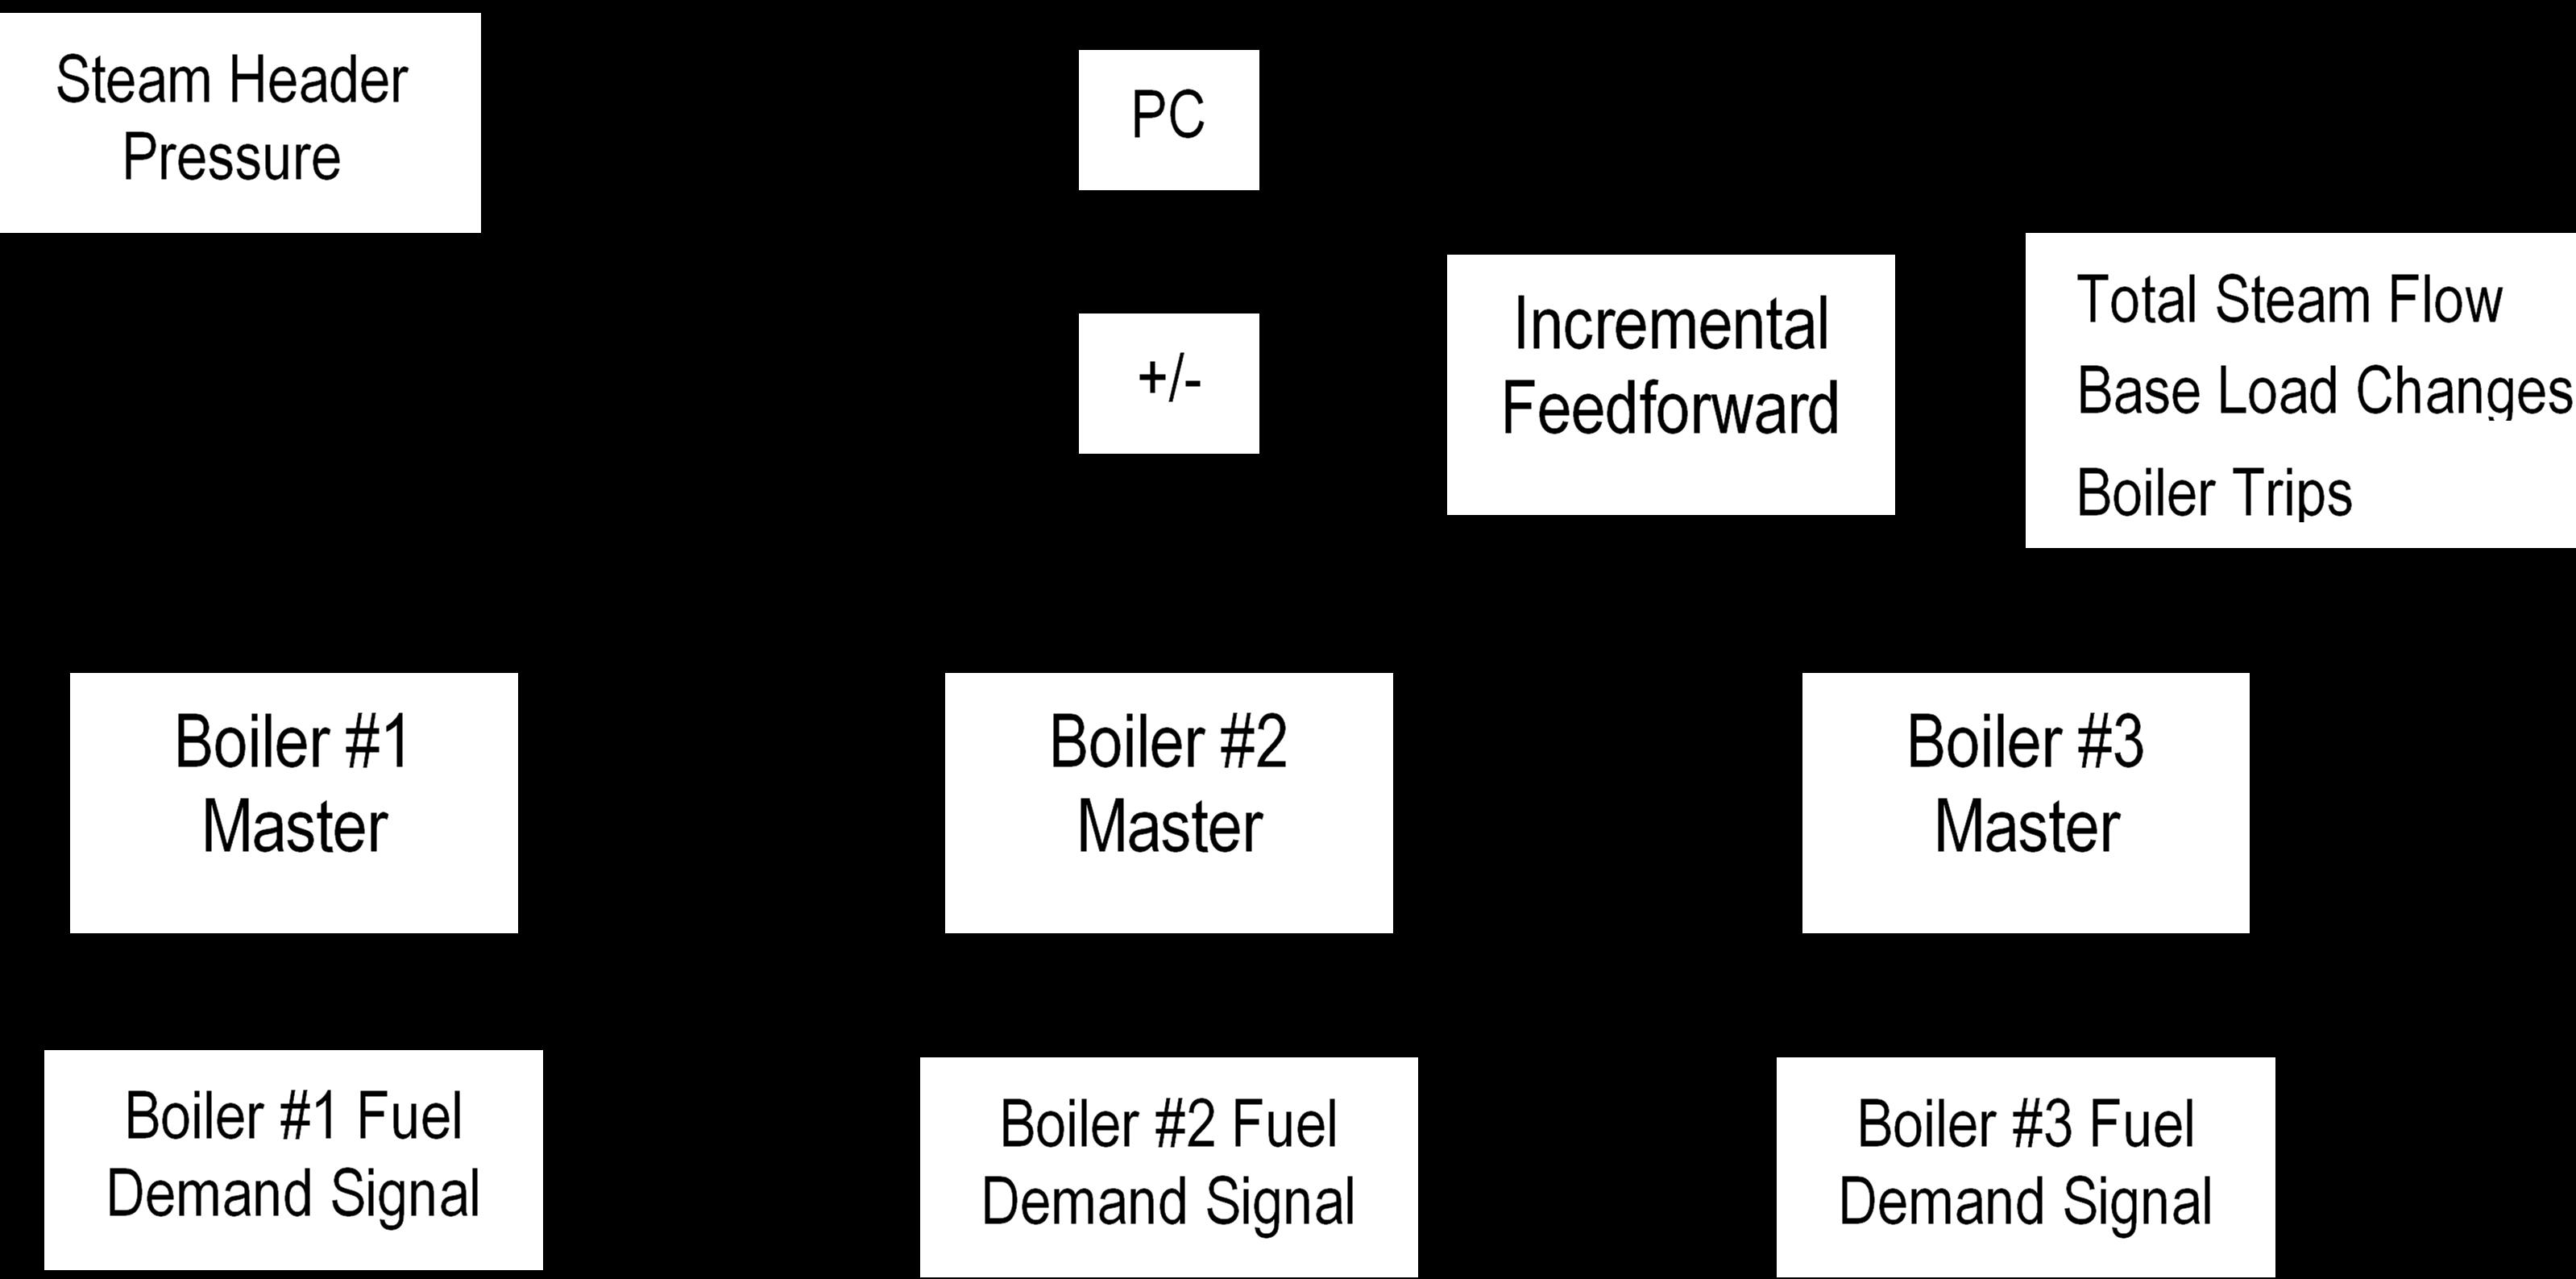 Figure 2 Plant Master Boiler Master Controls